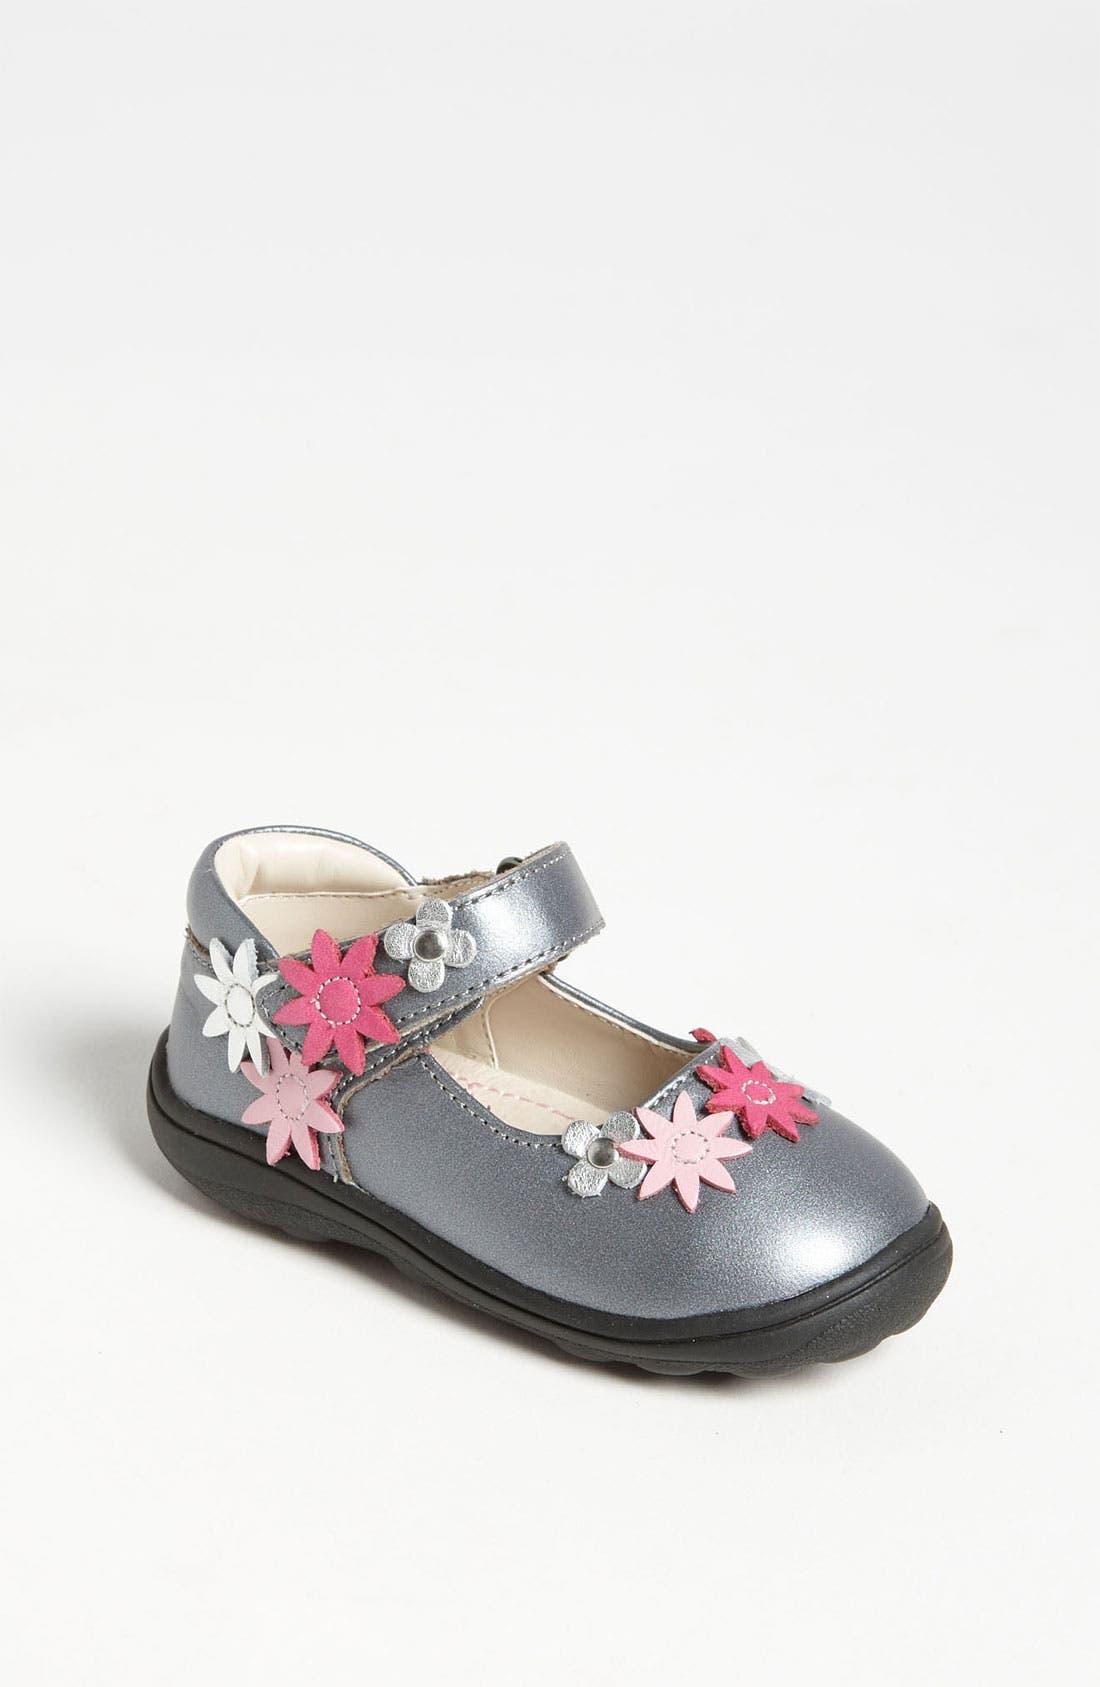 Alternate Image 1 Selected - Umi 'Flora' Mary Jane (Walker & Toddler)